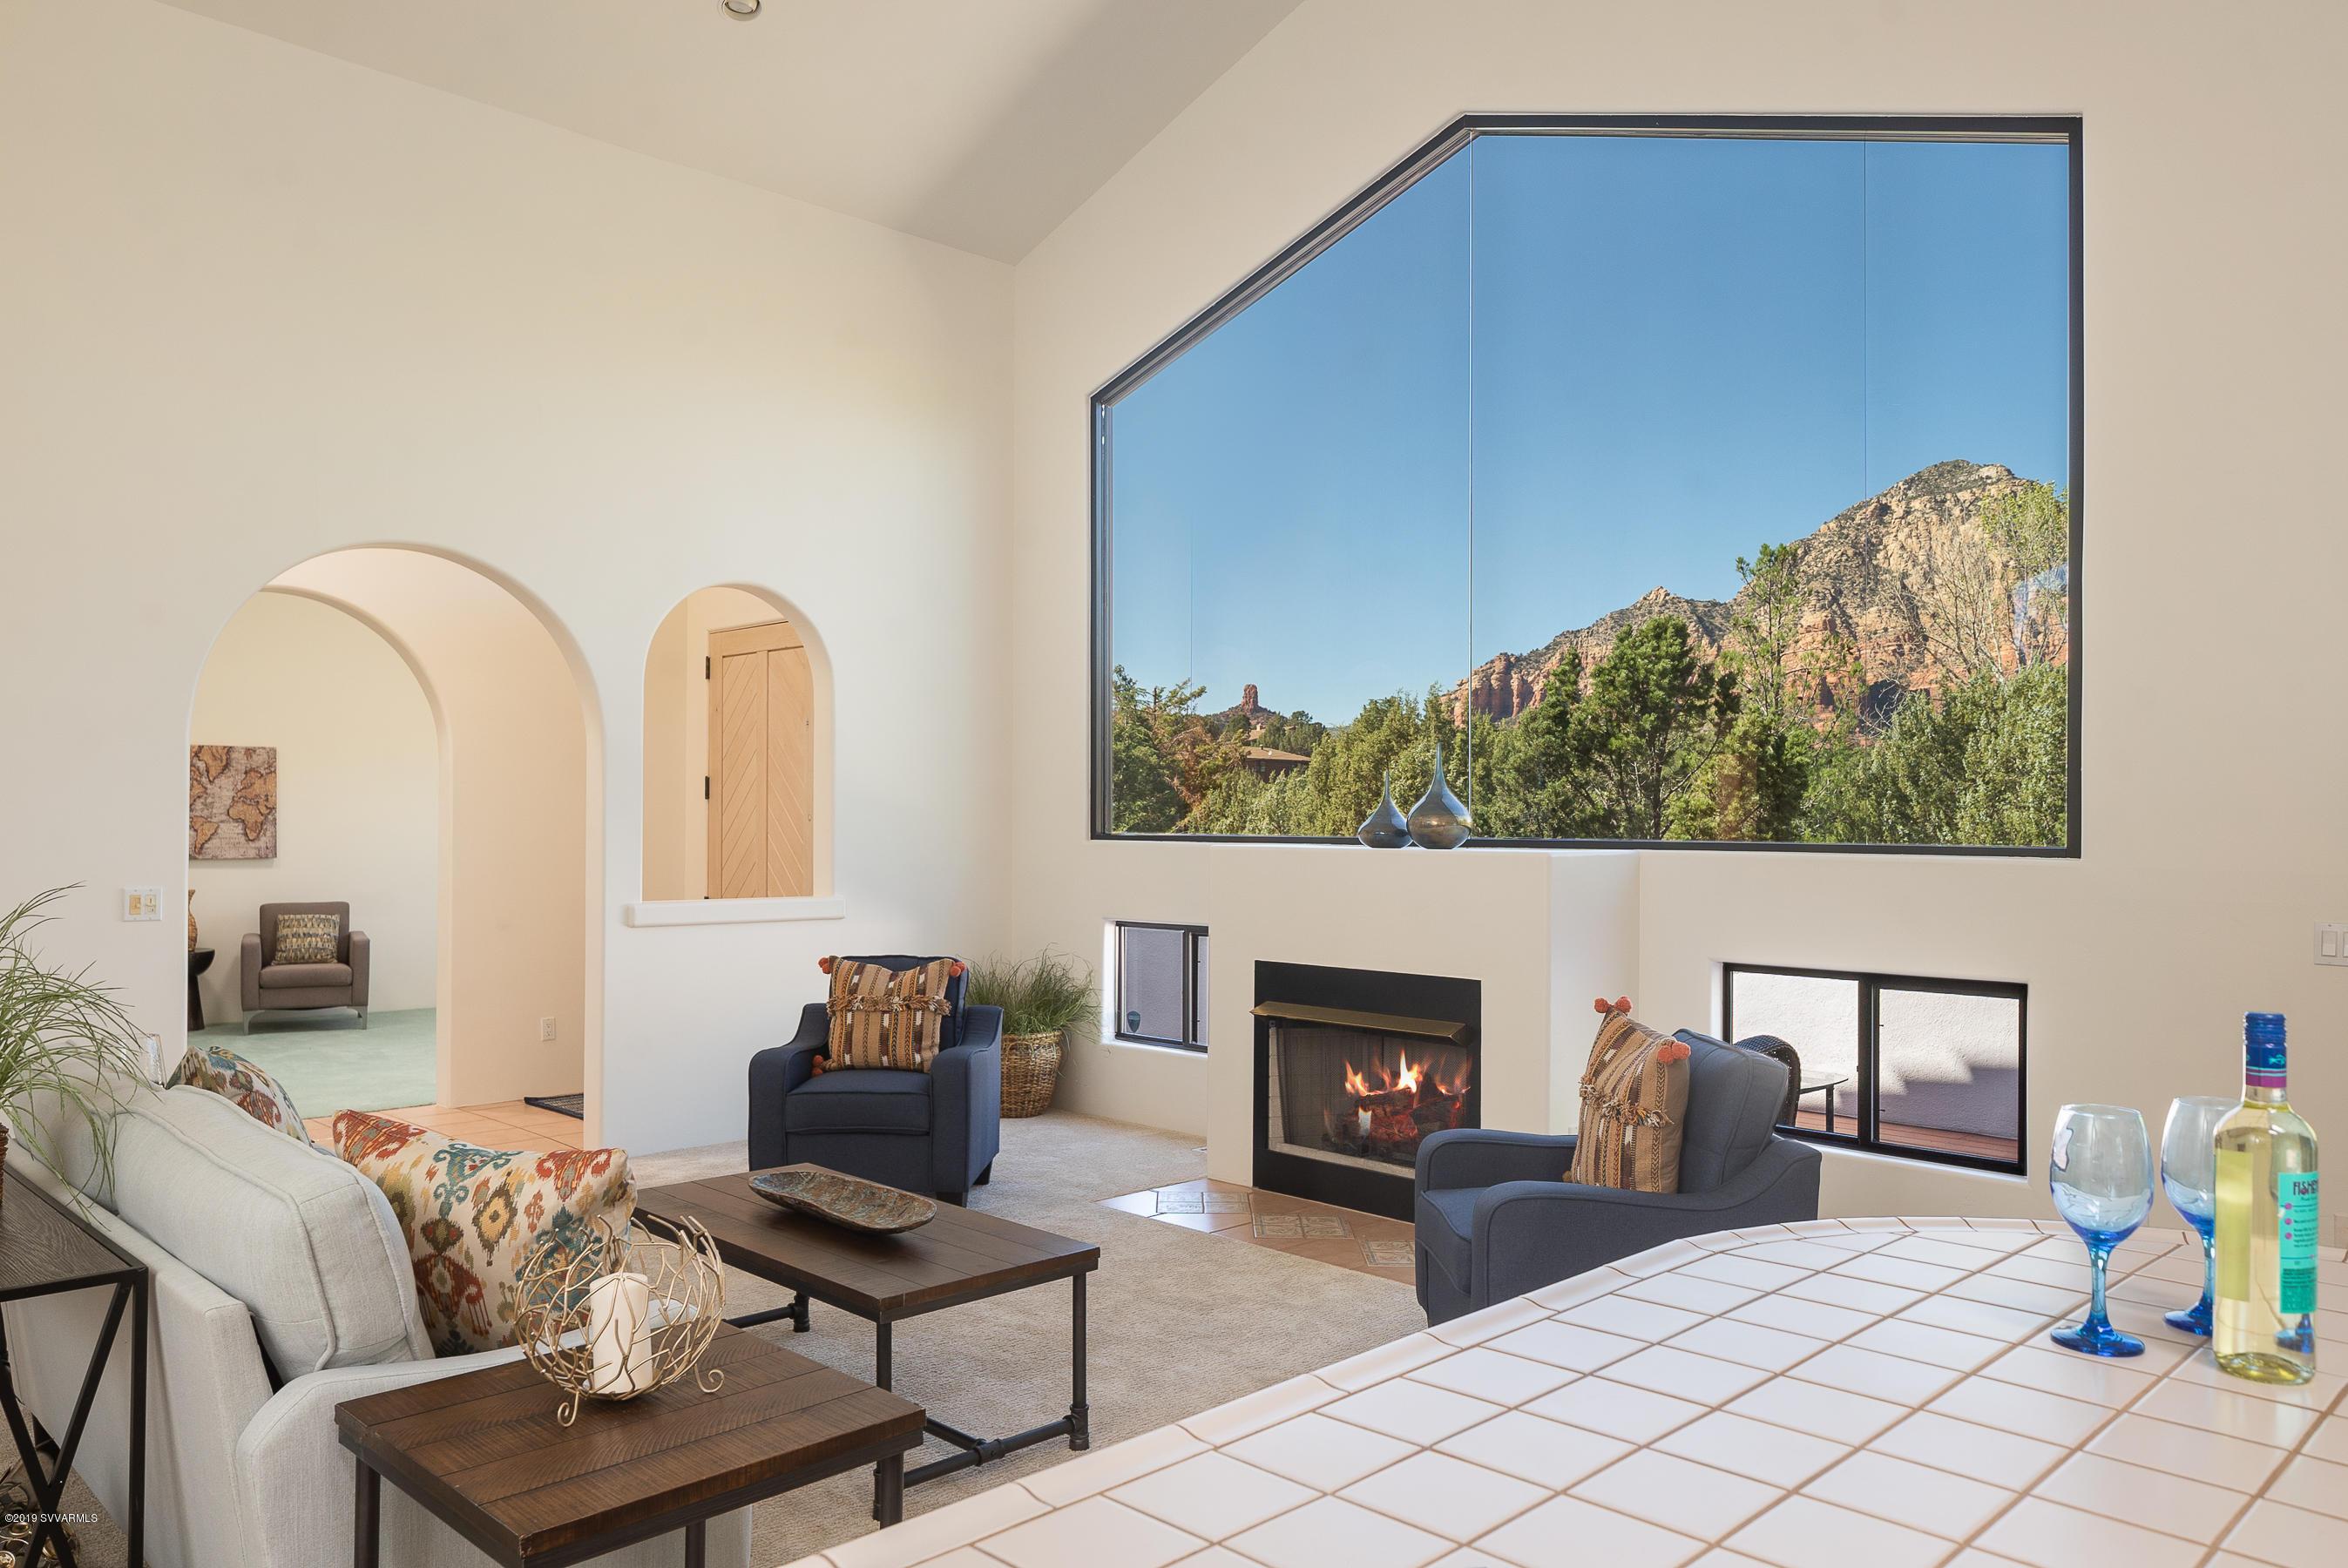 30 Santa Barbara Drive Sedona, AZ 86336